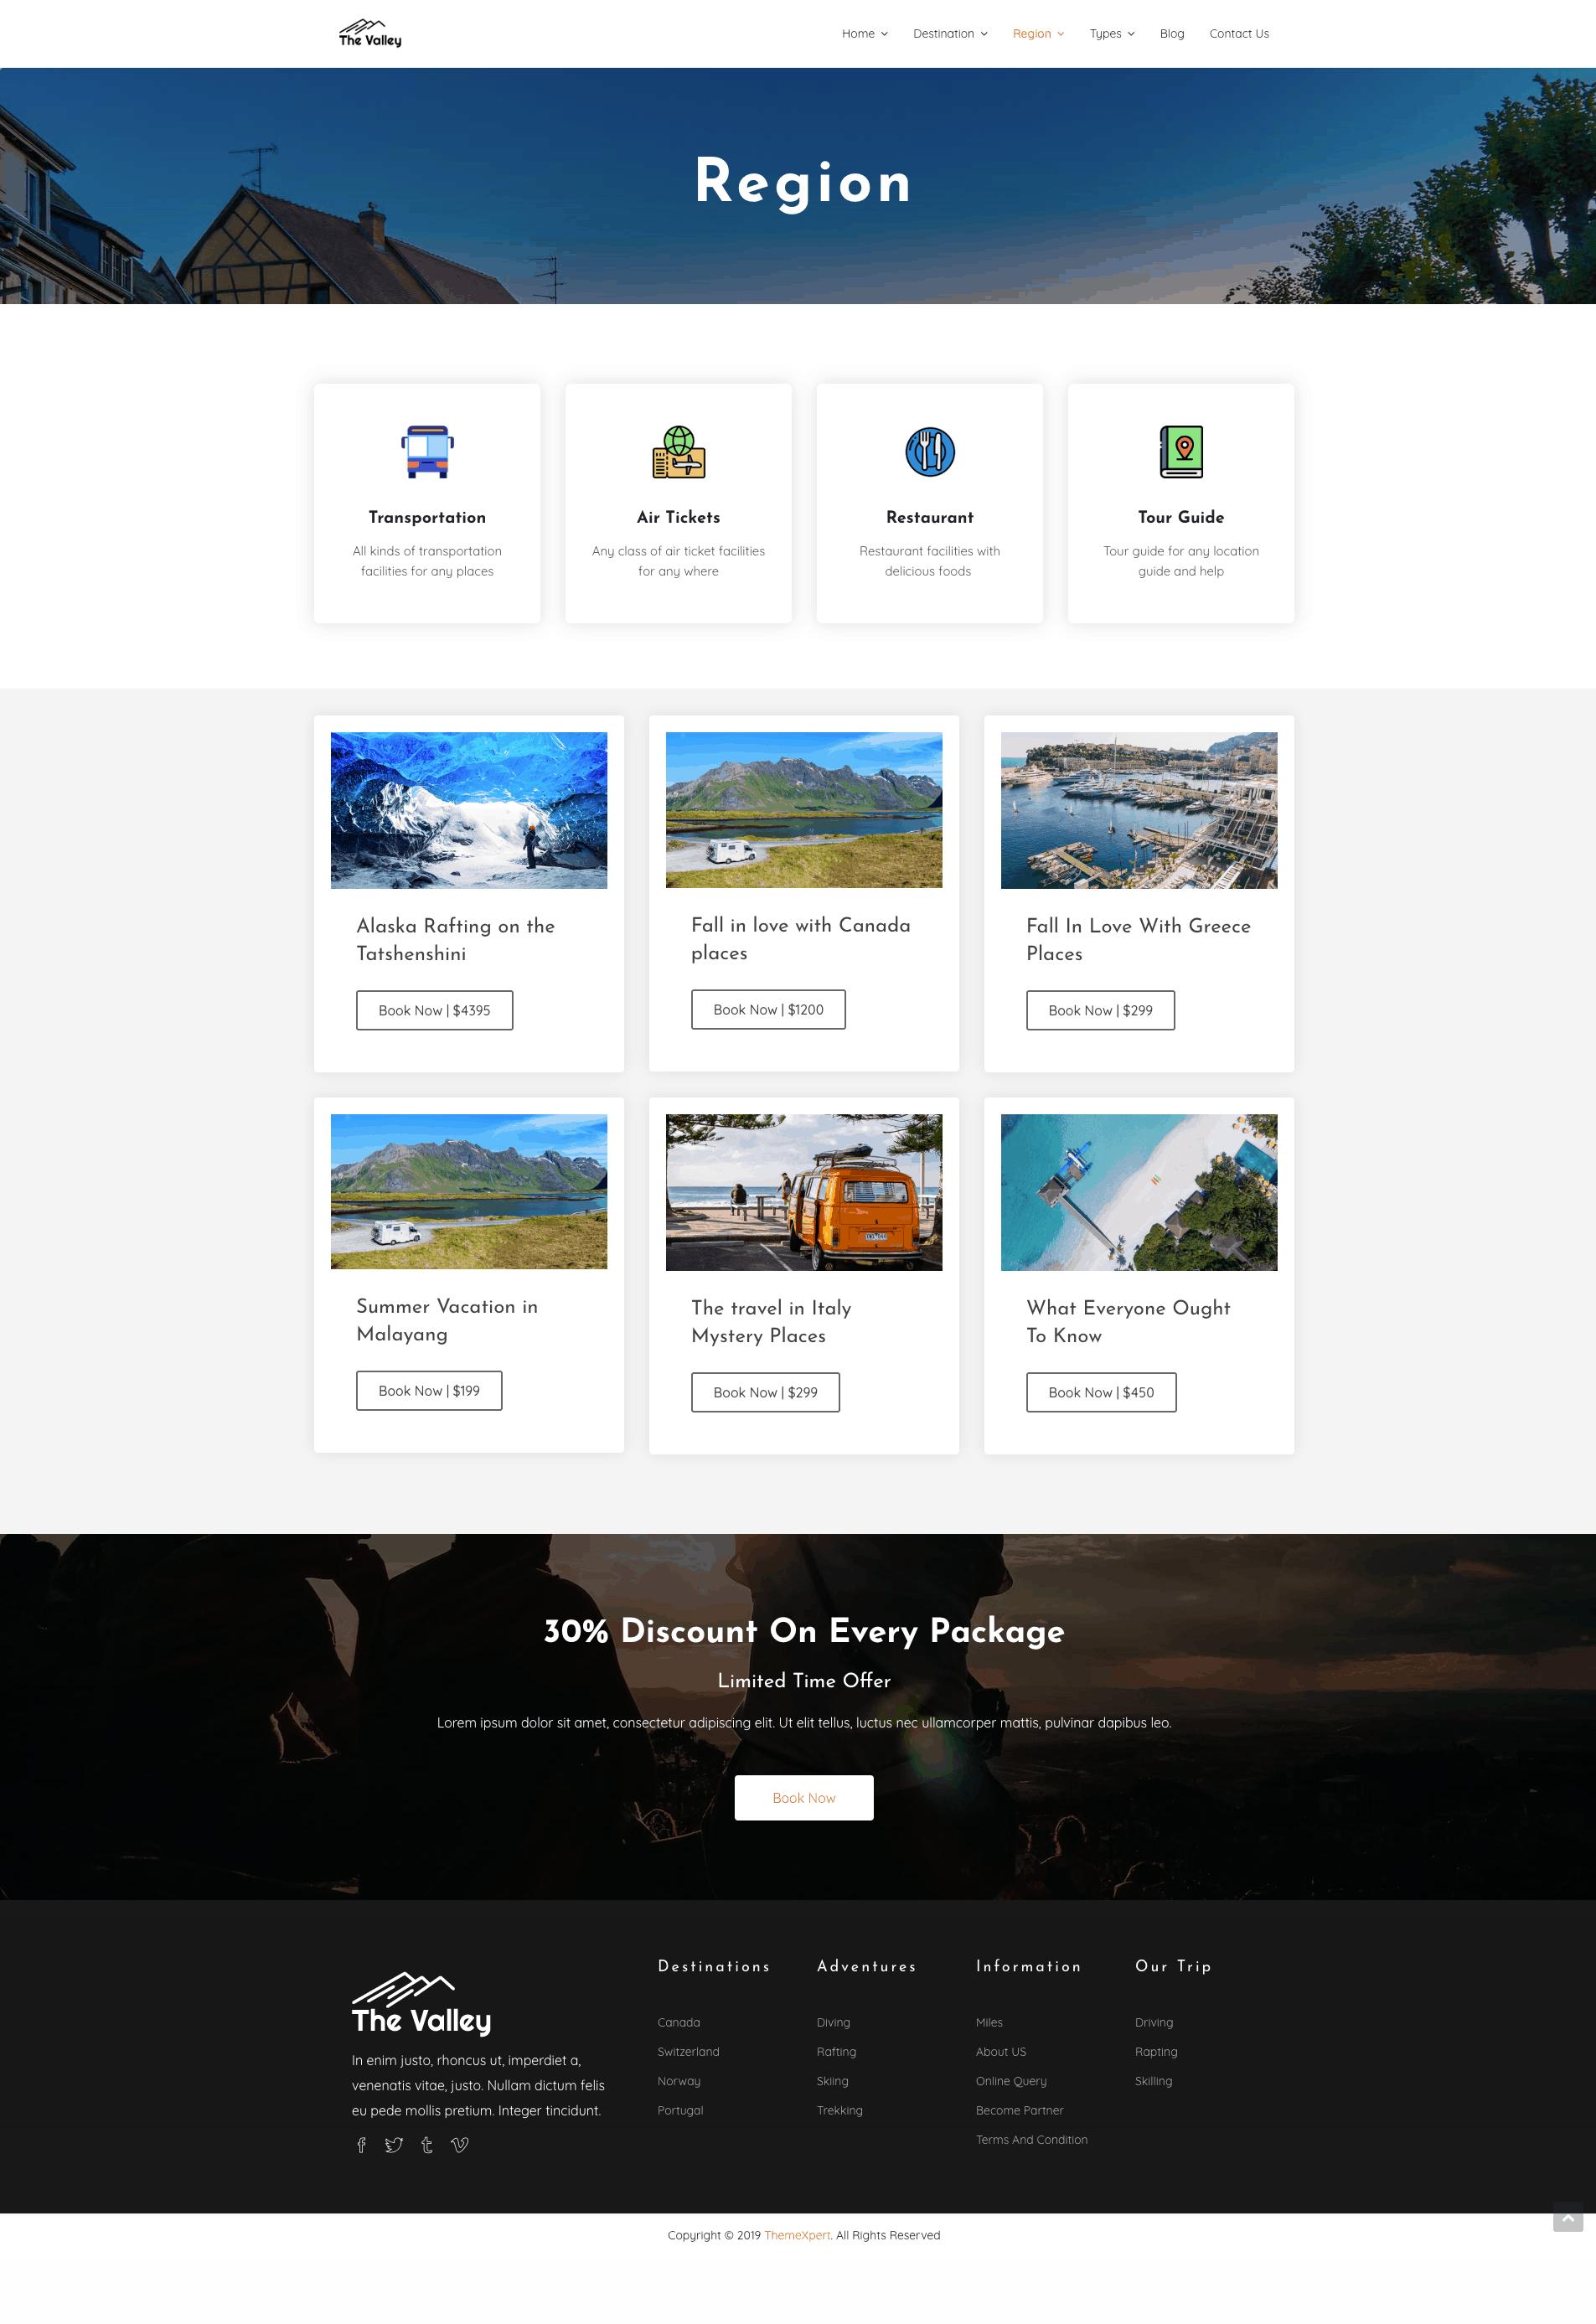 Region Page